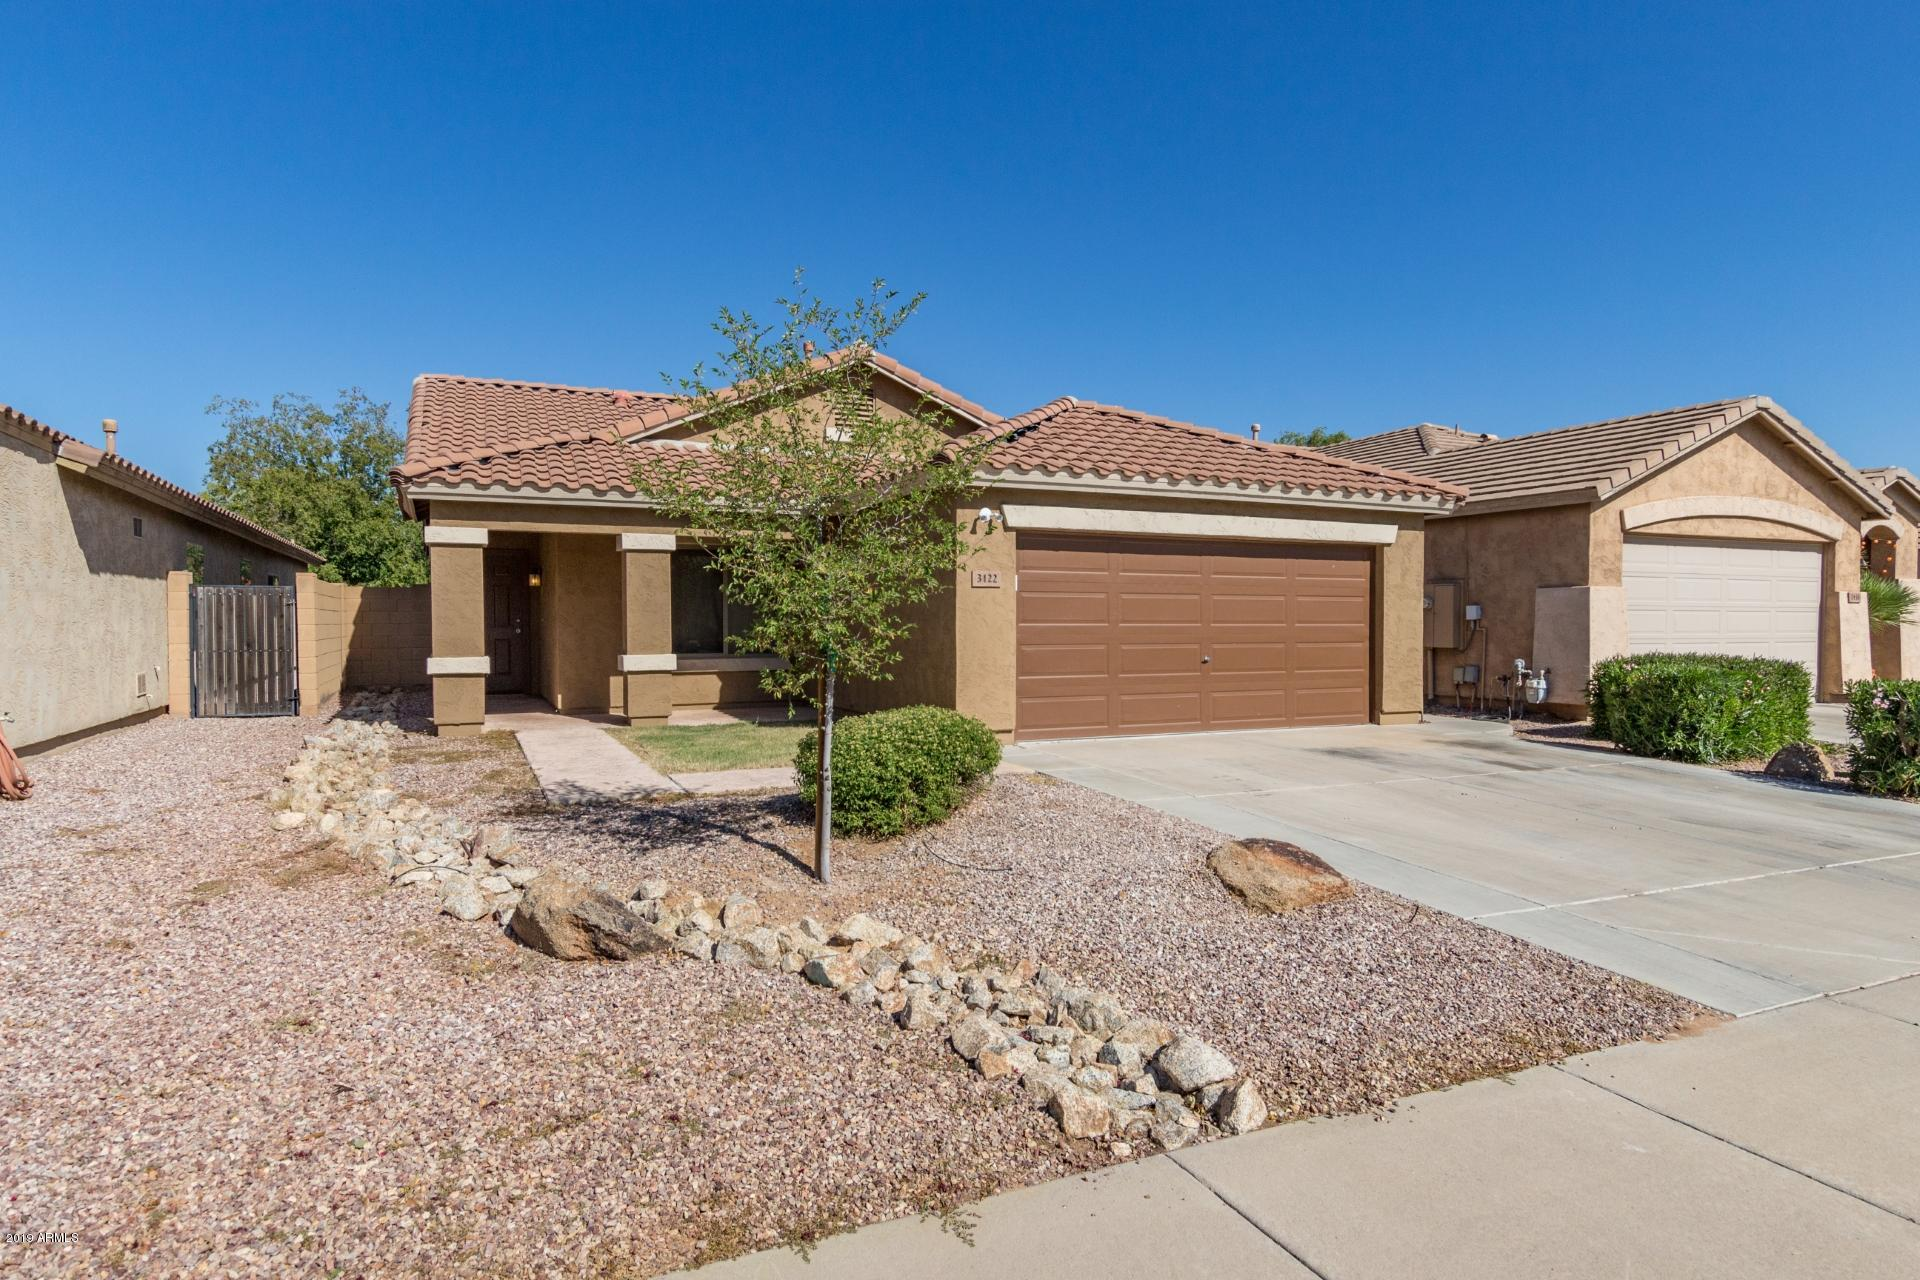 Photo of 3122 W DANCER Lane, Queen Creek, AZ 85142